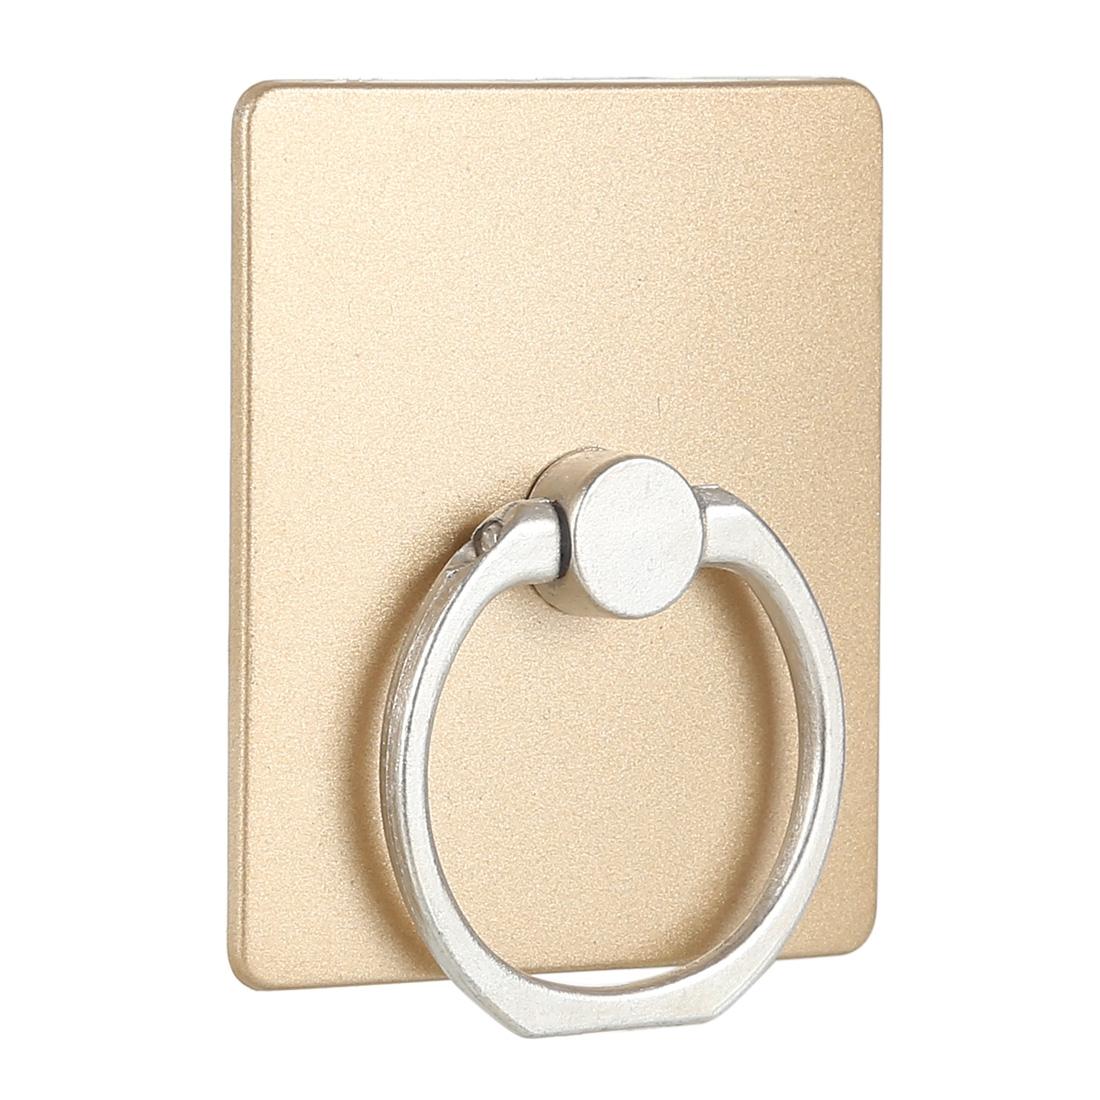 Suport pentru telefon tip inel MRG L343, Gold, Rotire 360 grade